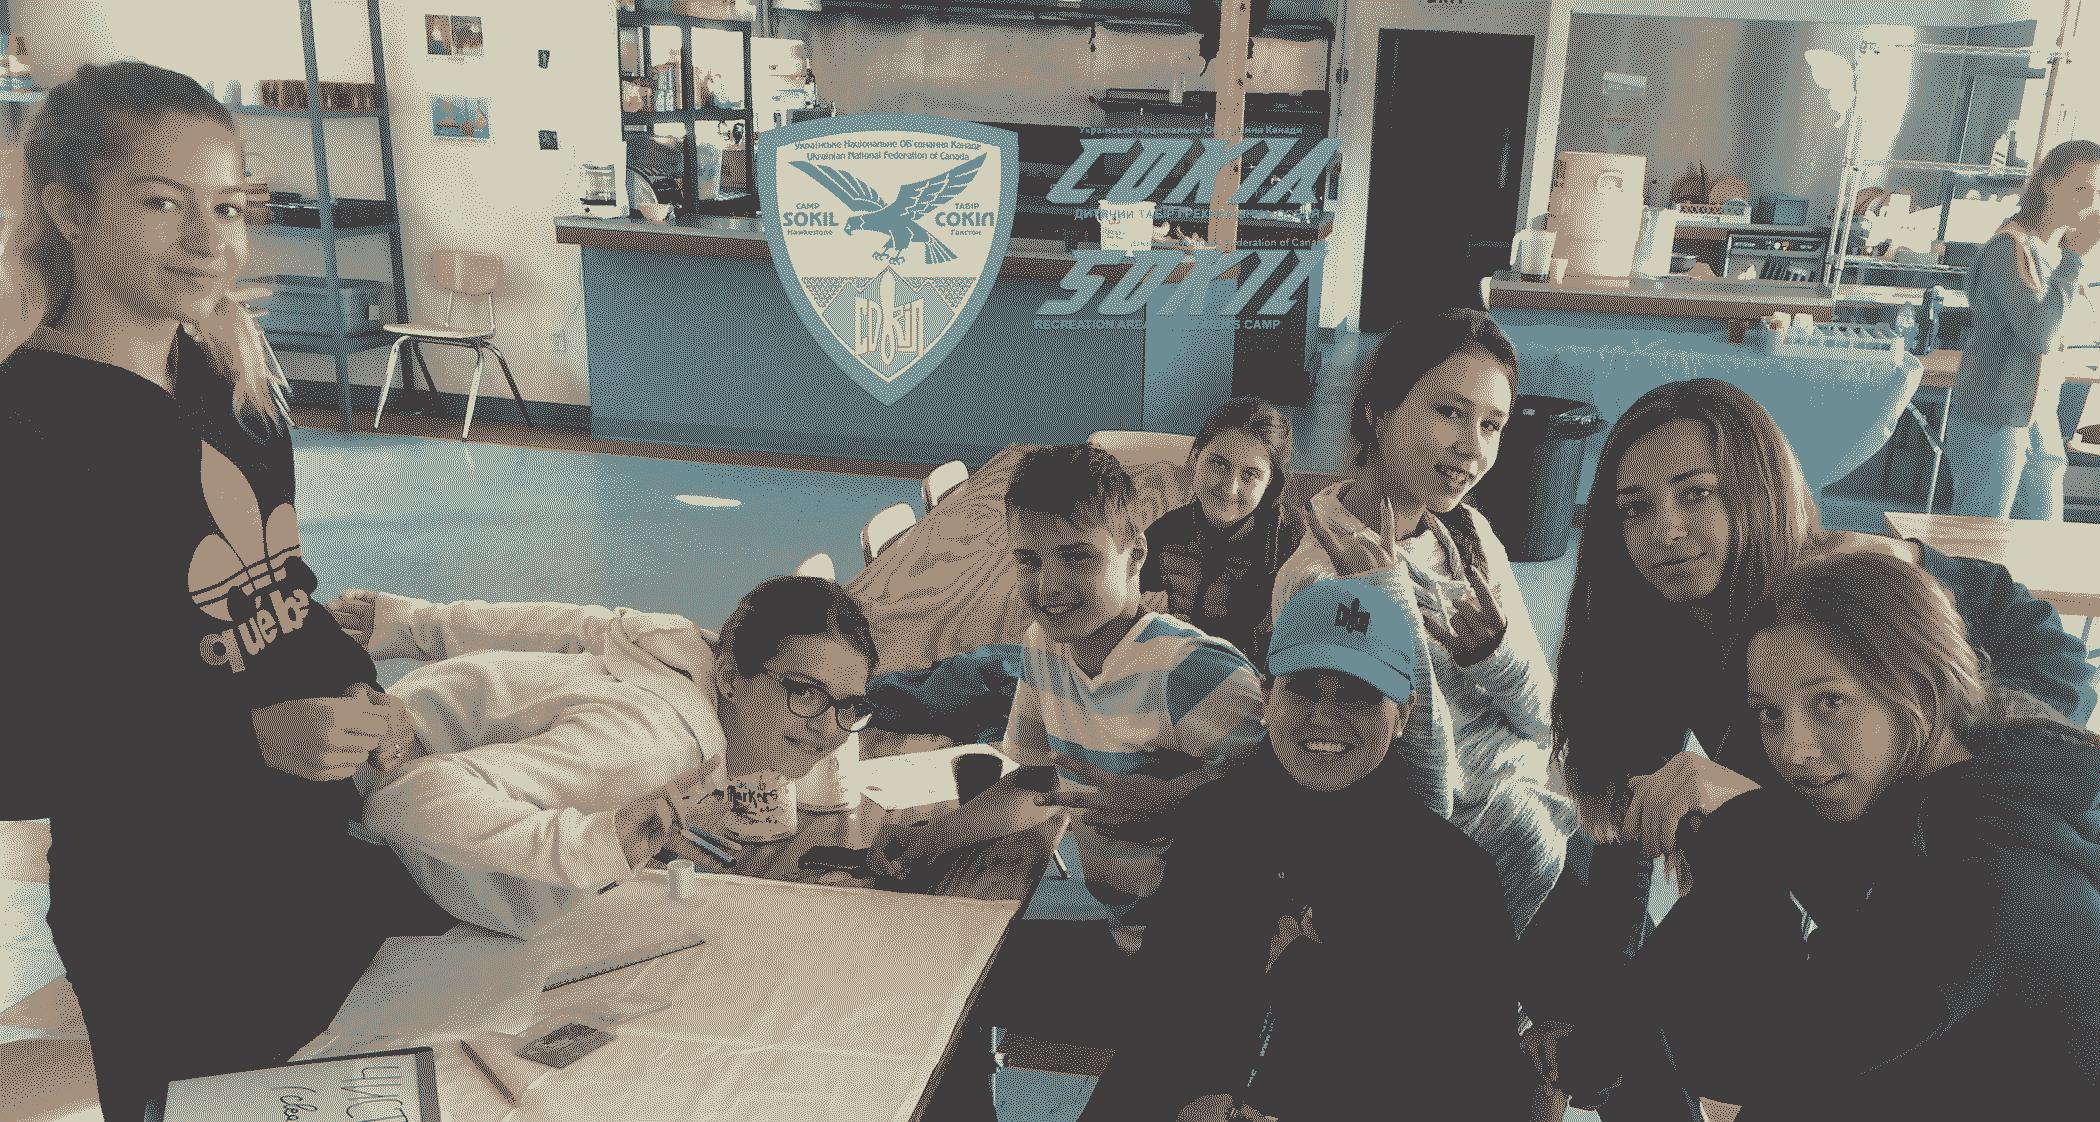 CAMP SOKIL – CHILDREN'S CAMP